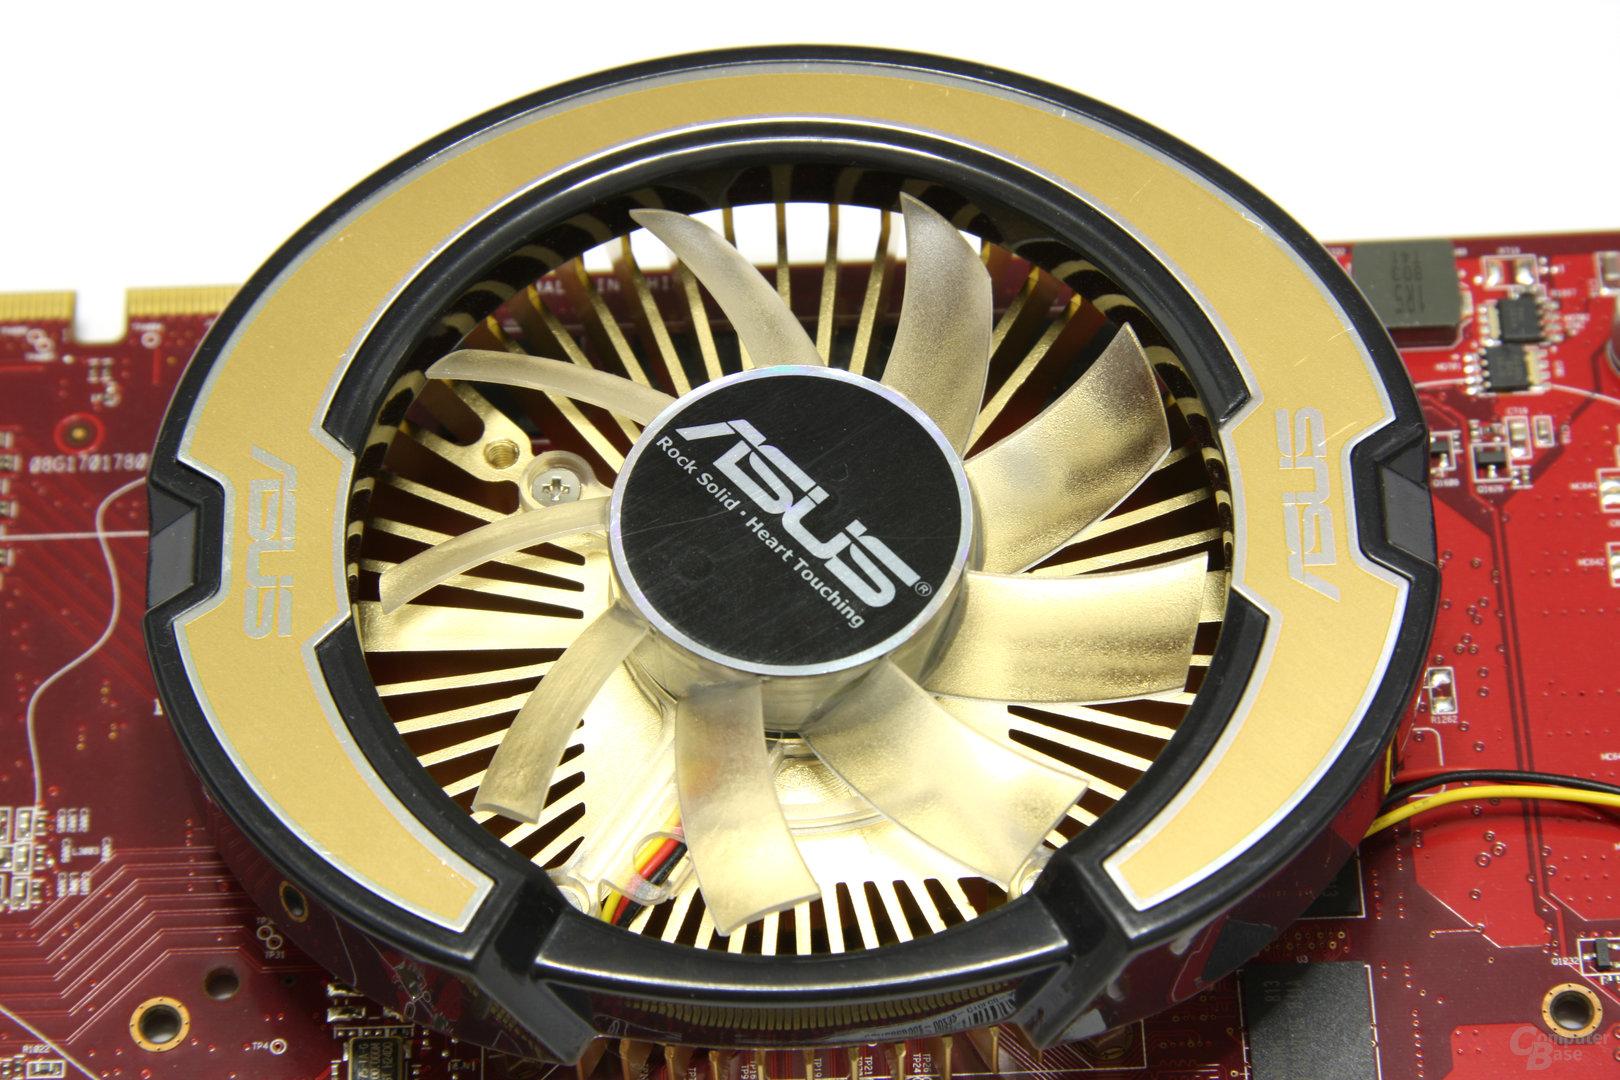 Radeon HD 4850 TOP Lüfter